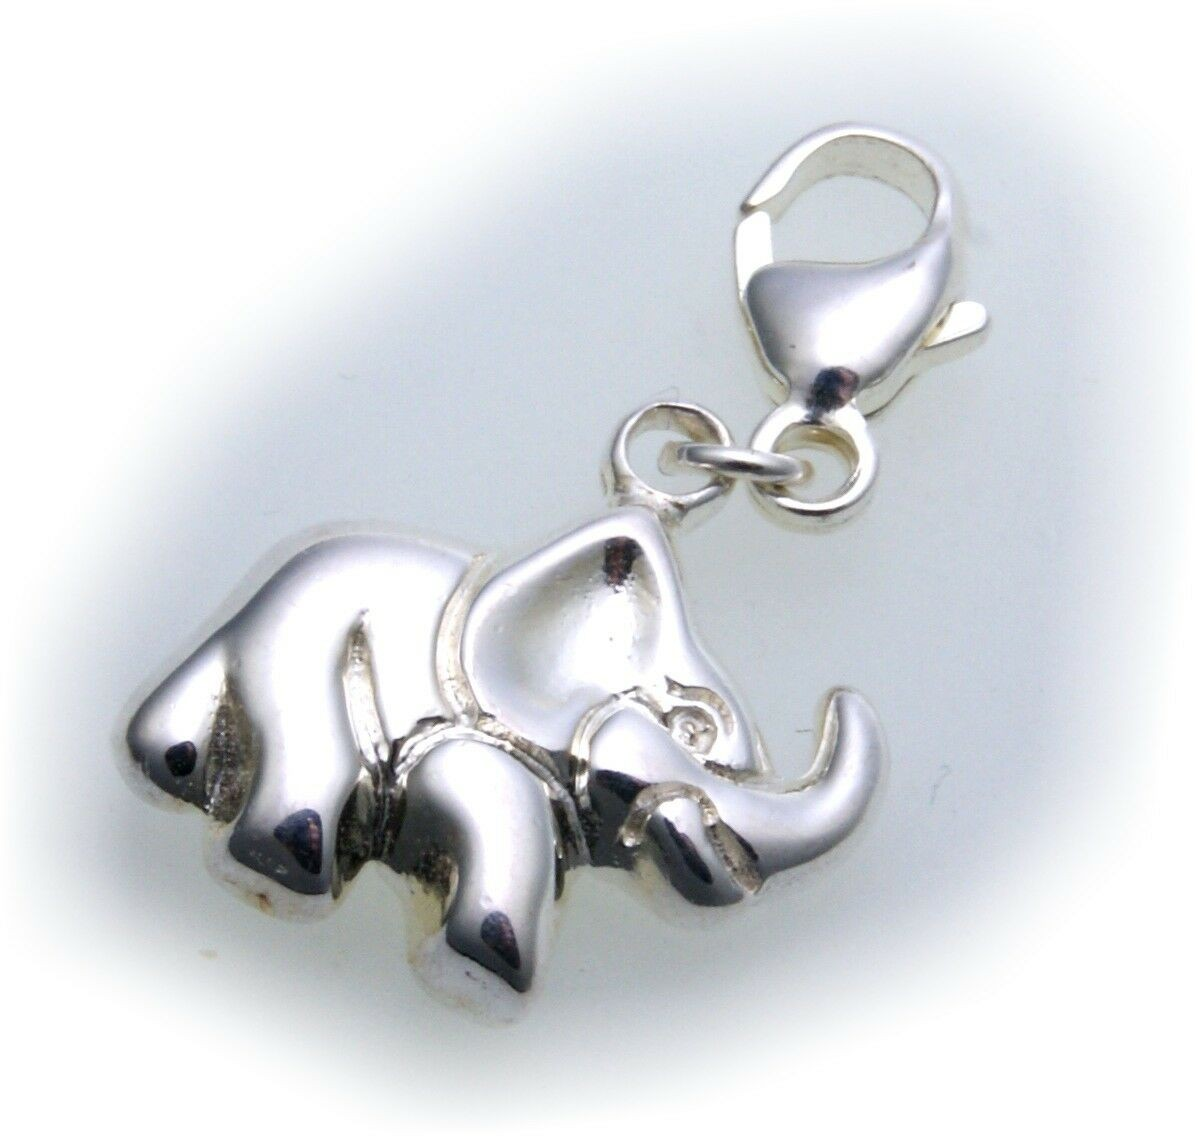 Anhänger Charm Elefant echt Silber 925 Bettelarmband Sterlingsilber Qualität